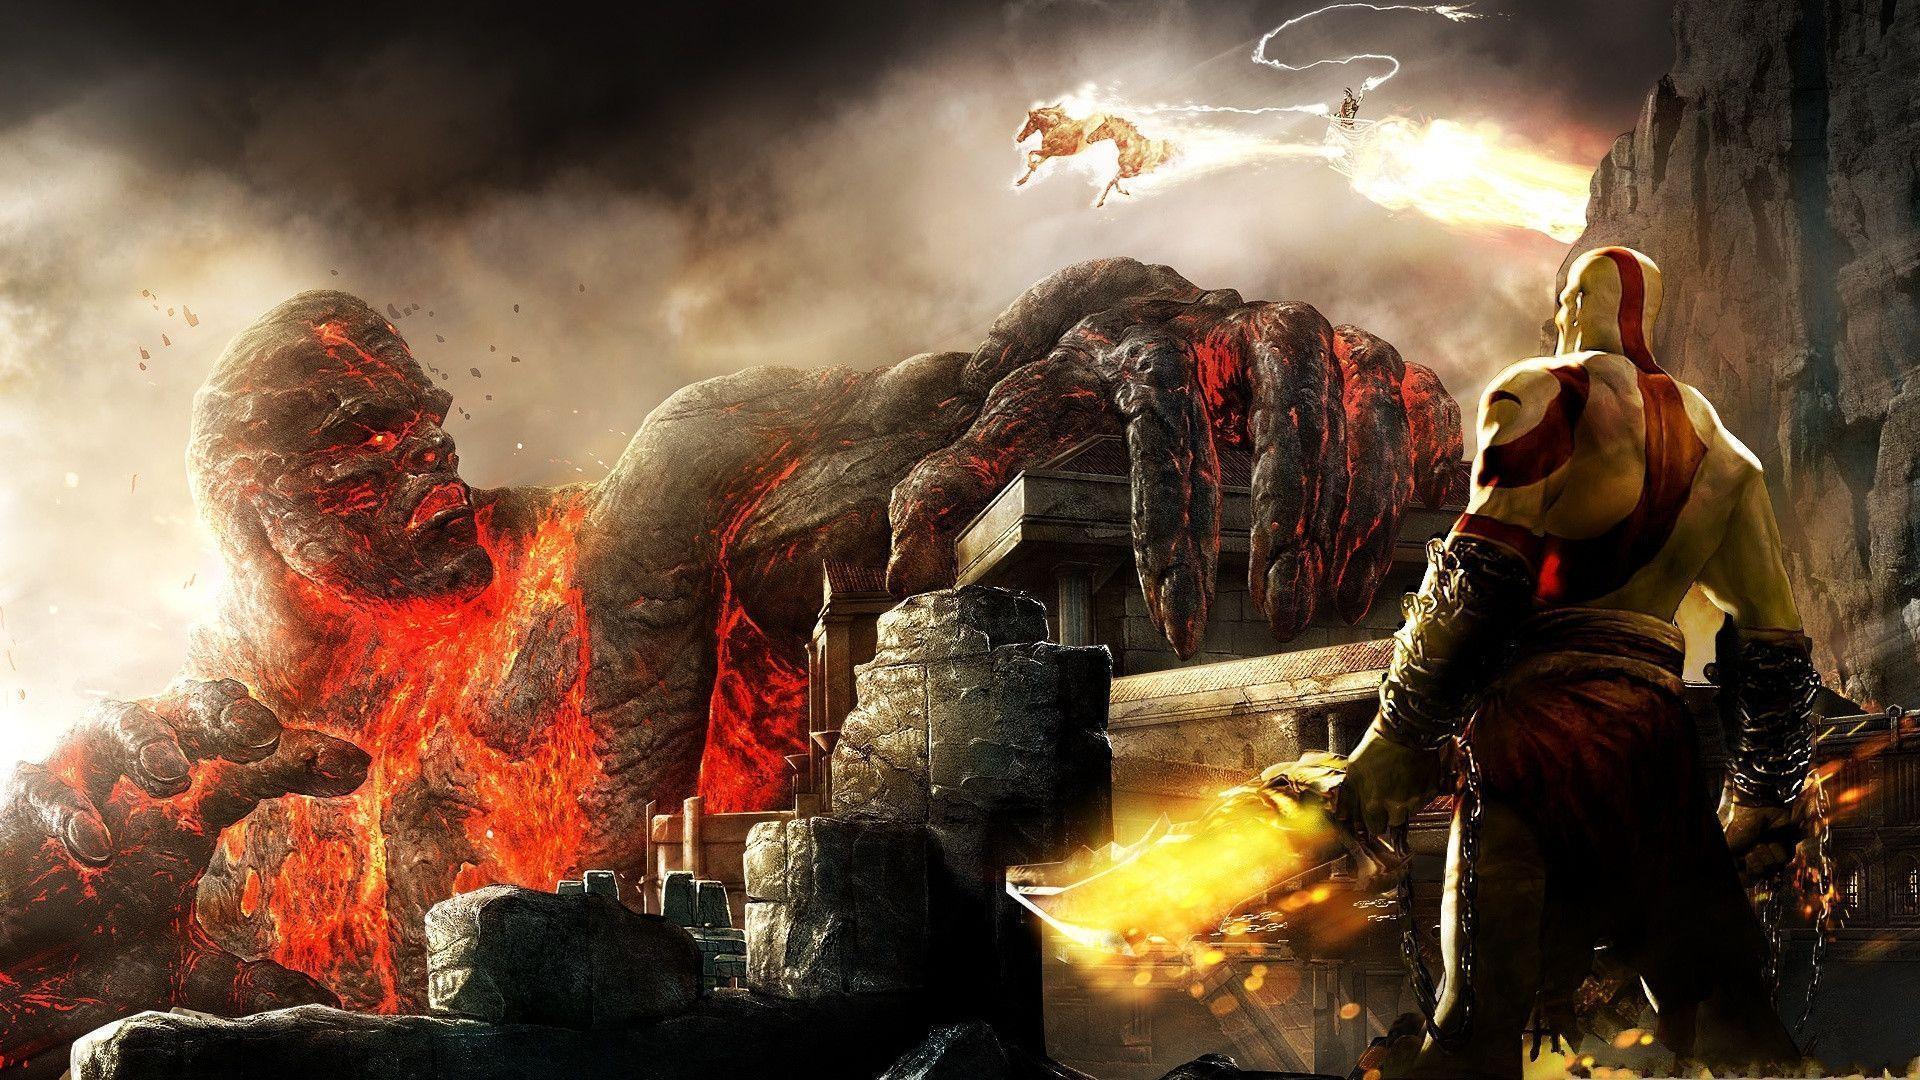 god of war 1 wallpaper hd - photo #17